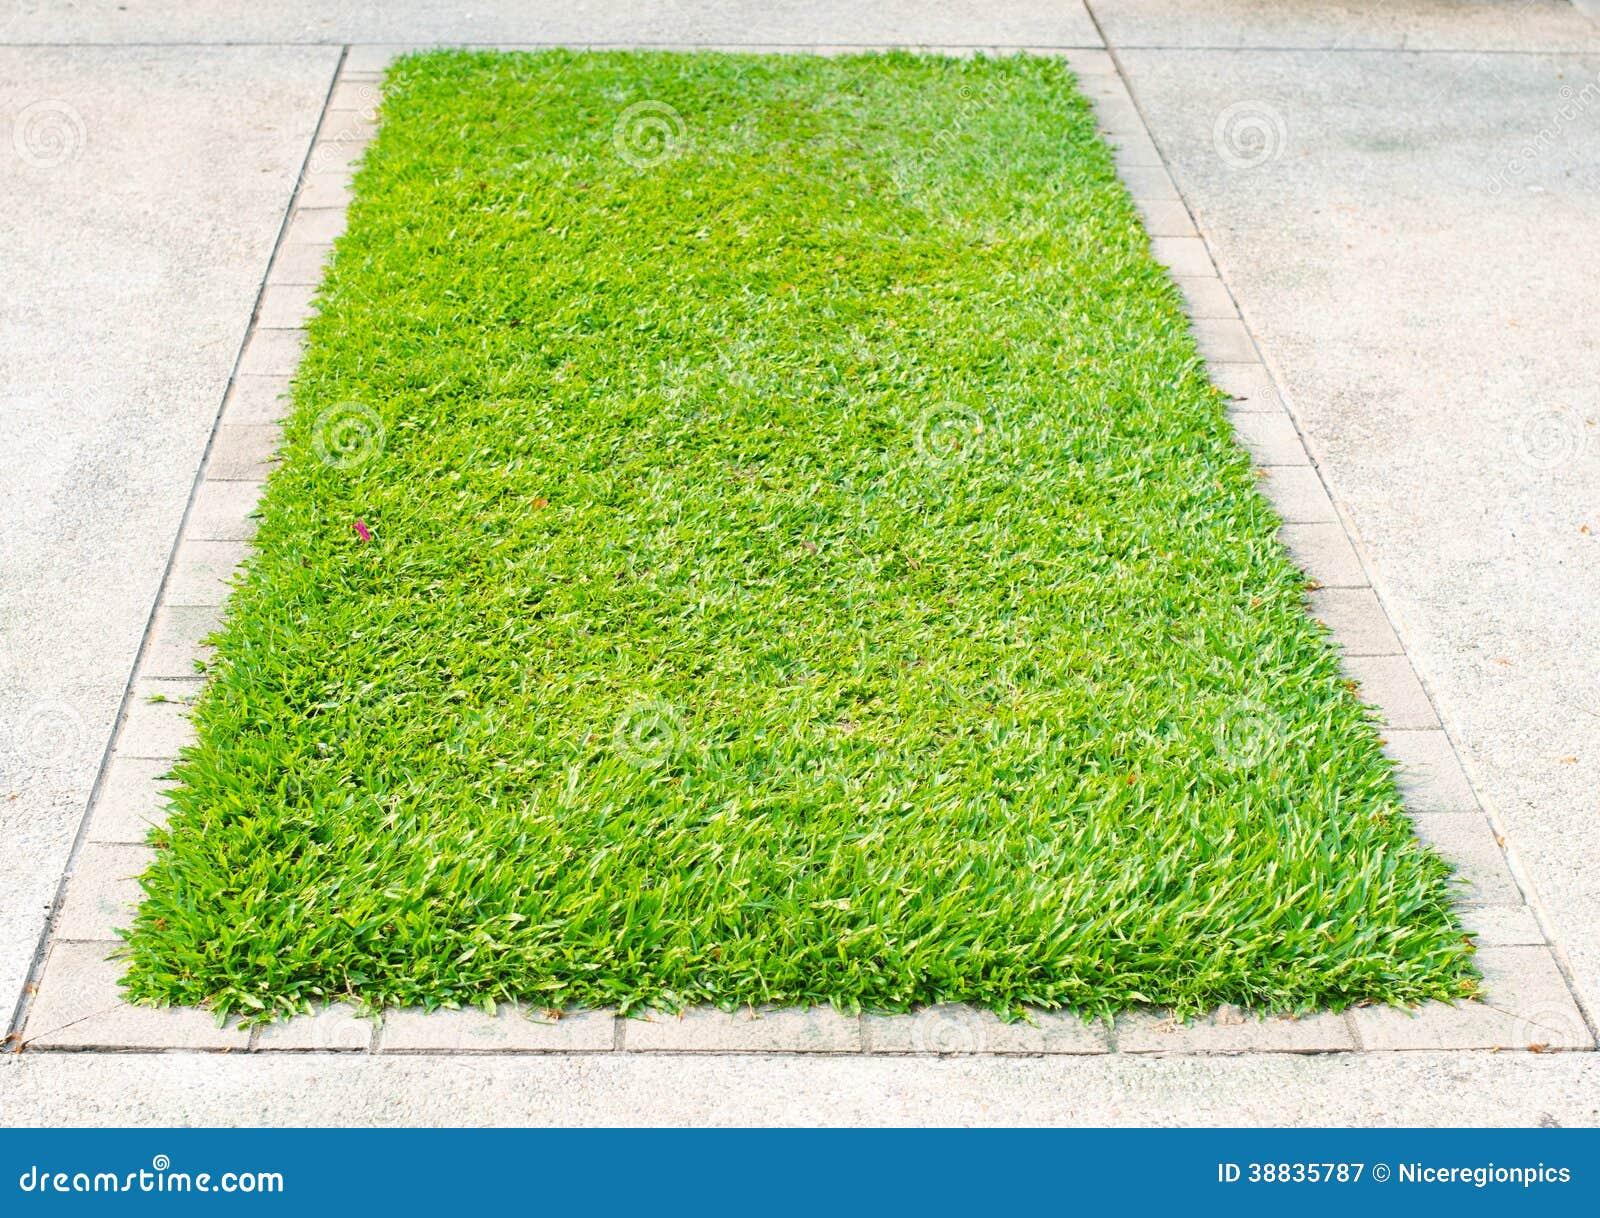 Green Grass On Square Concrete Block Stock Photo Image